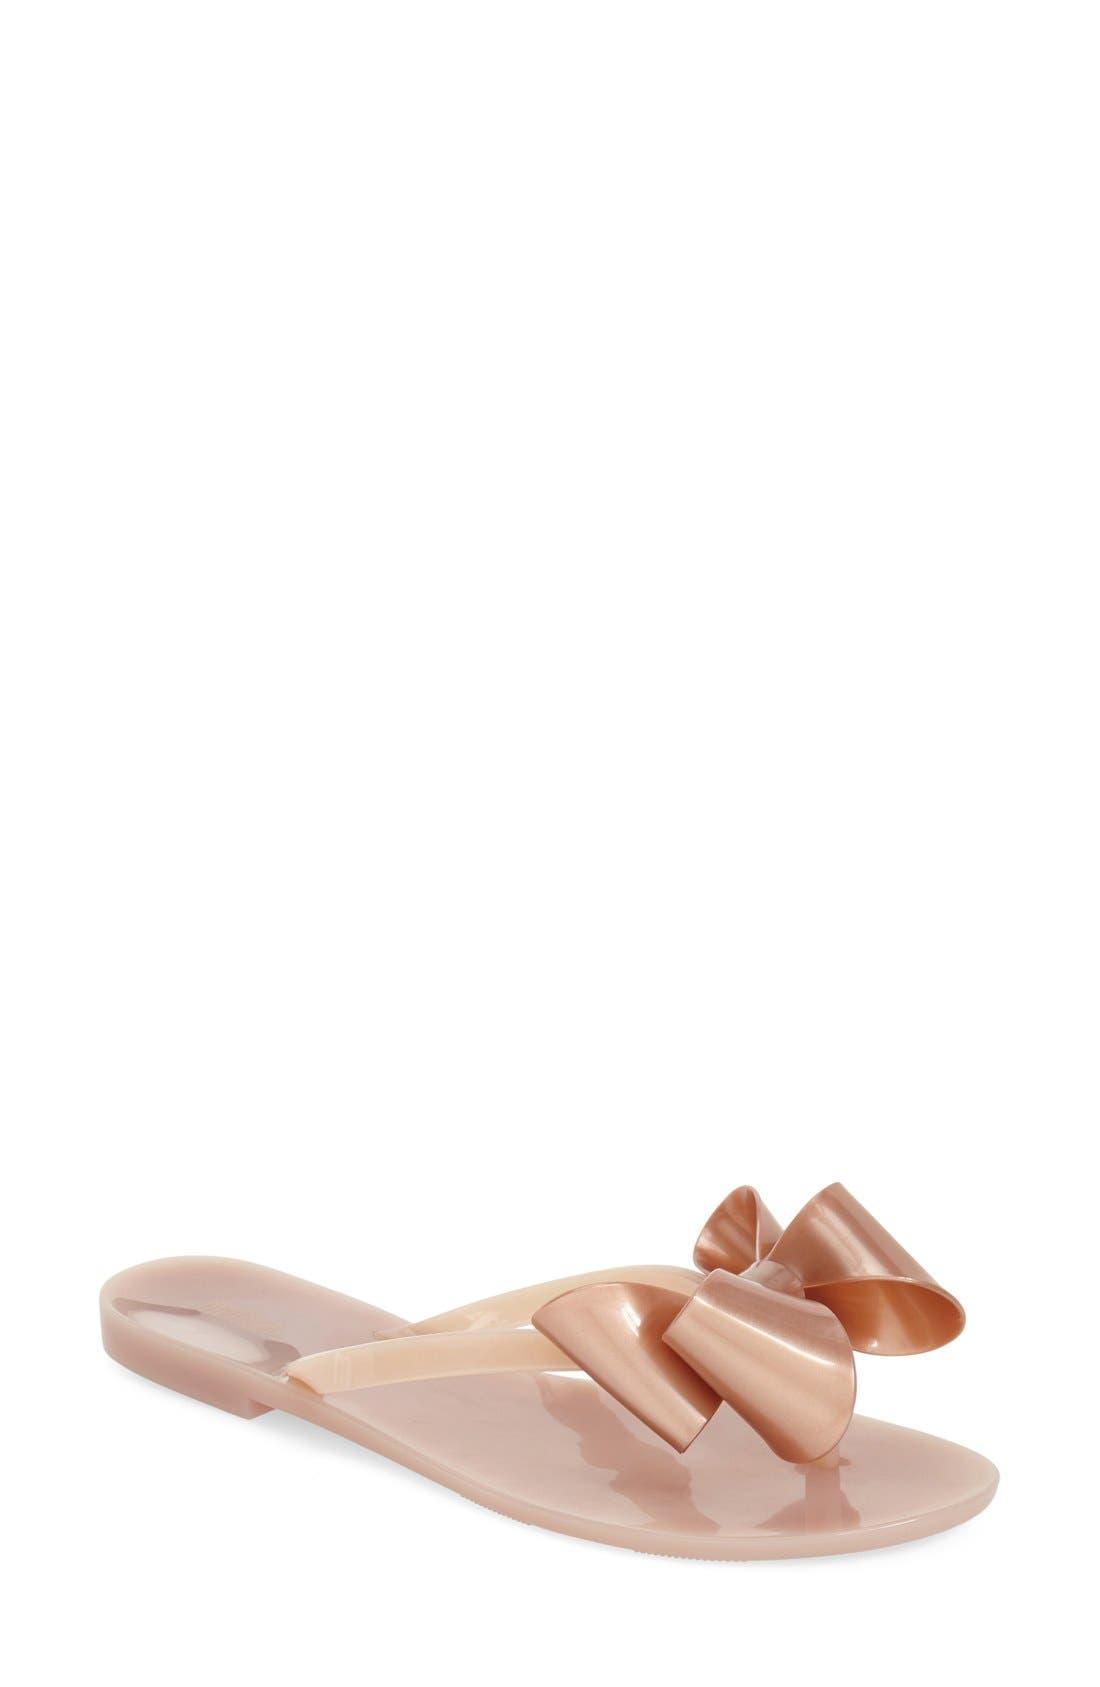 Alternate Image 1 Selected - Melissa 'Harmonic Bow' Jelly Thong Sandal (Women)